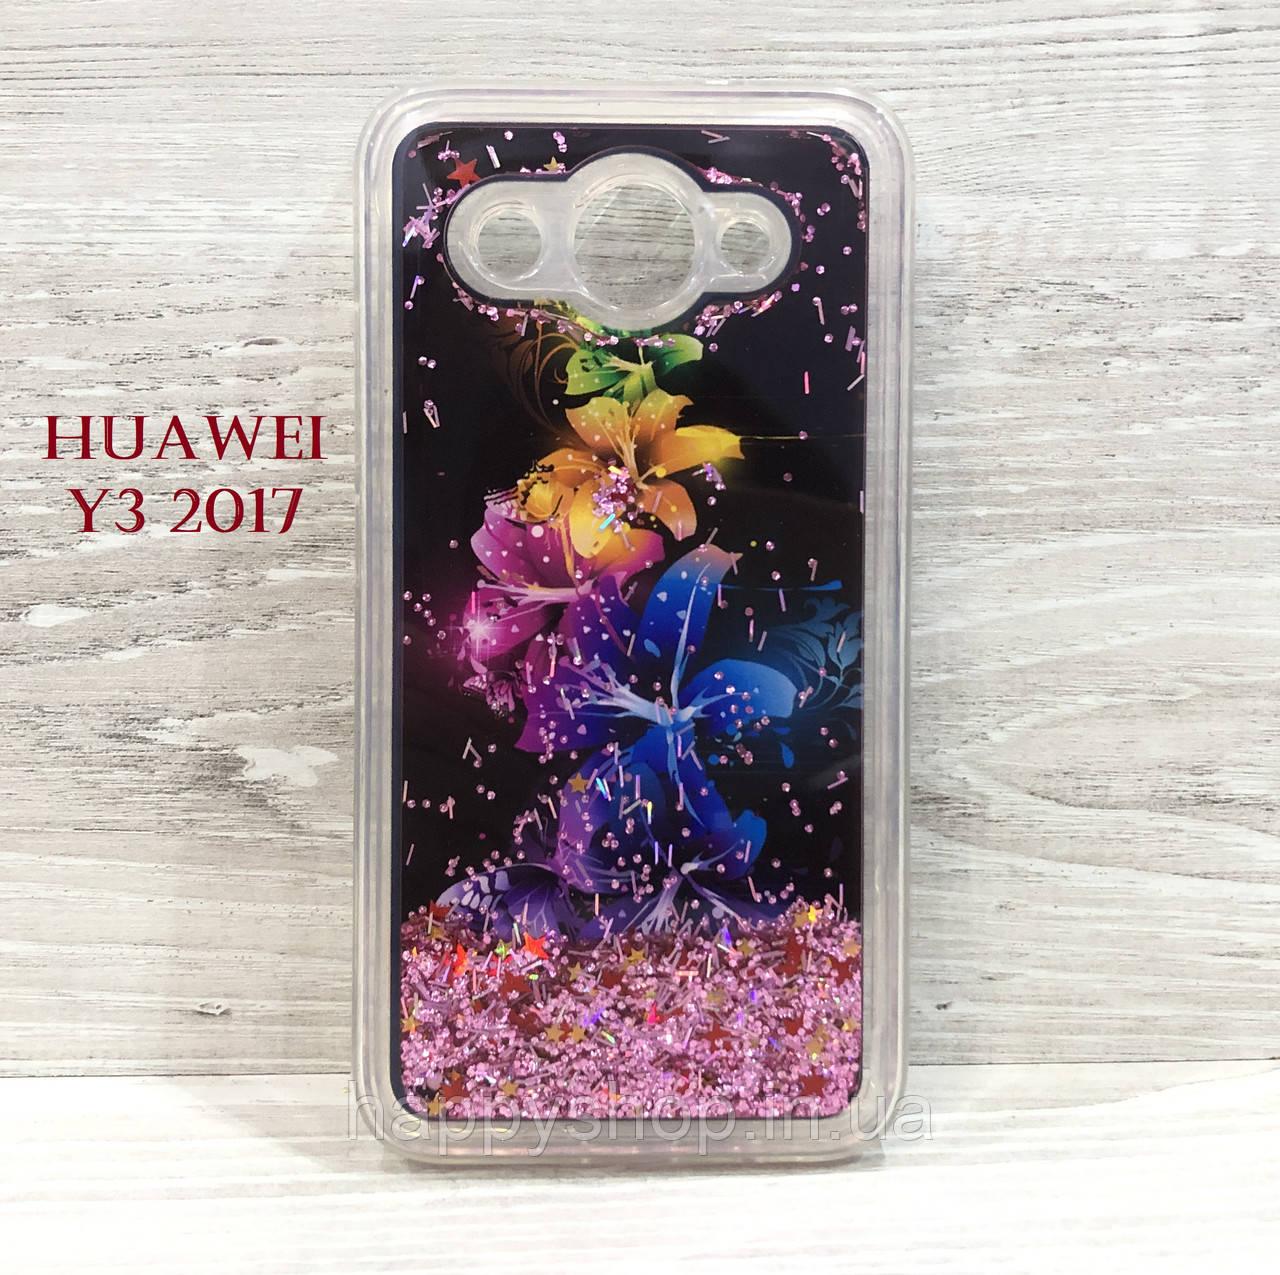 Чехол переливашка Beckberg Aqua для Huawei Y3 2017 (Black Impression)